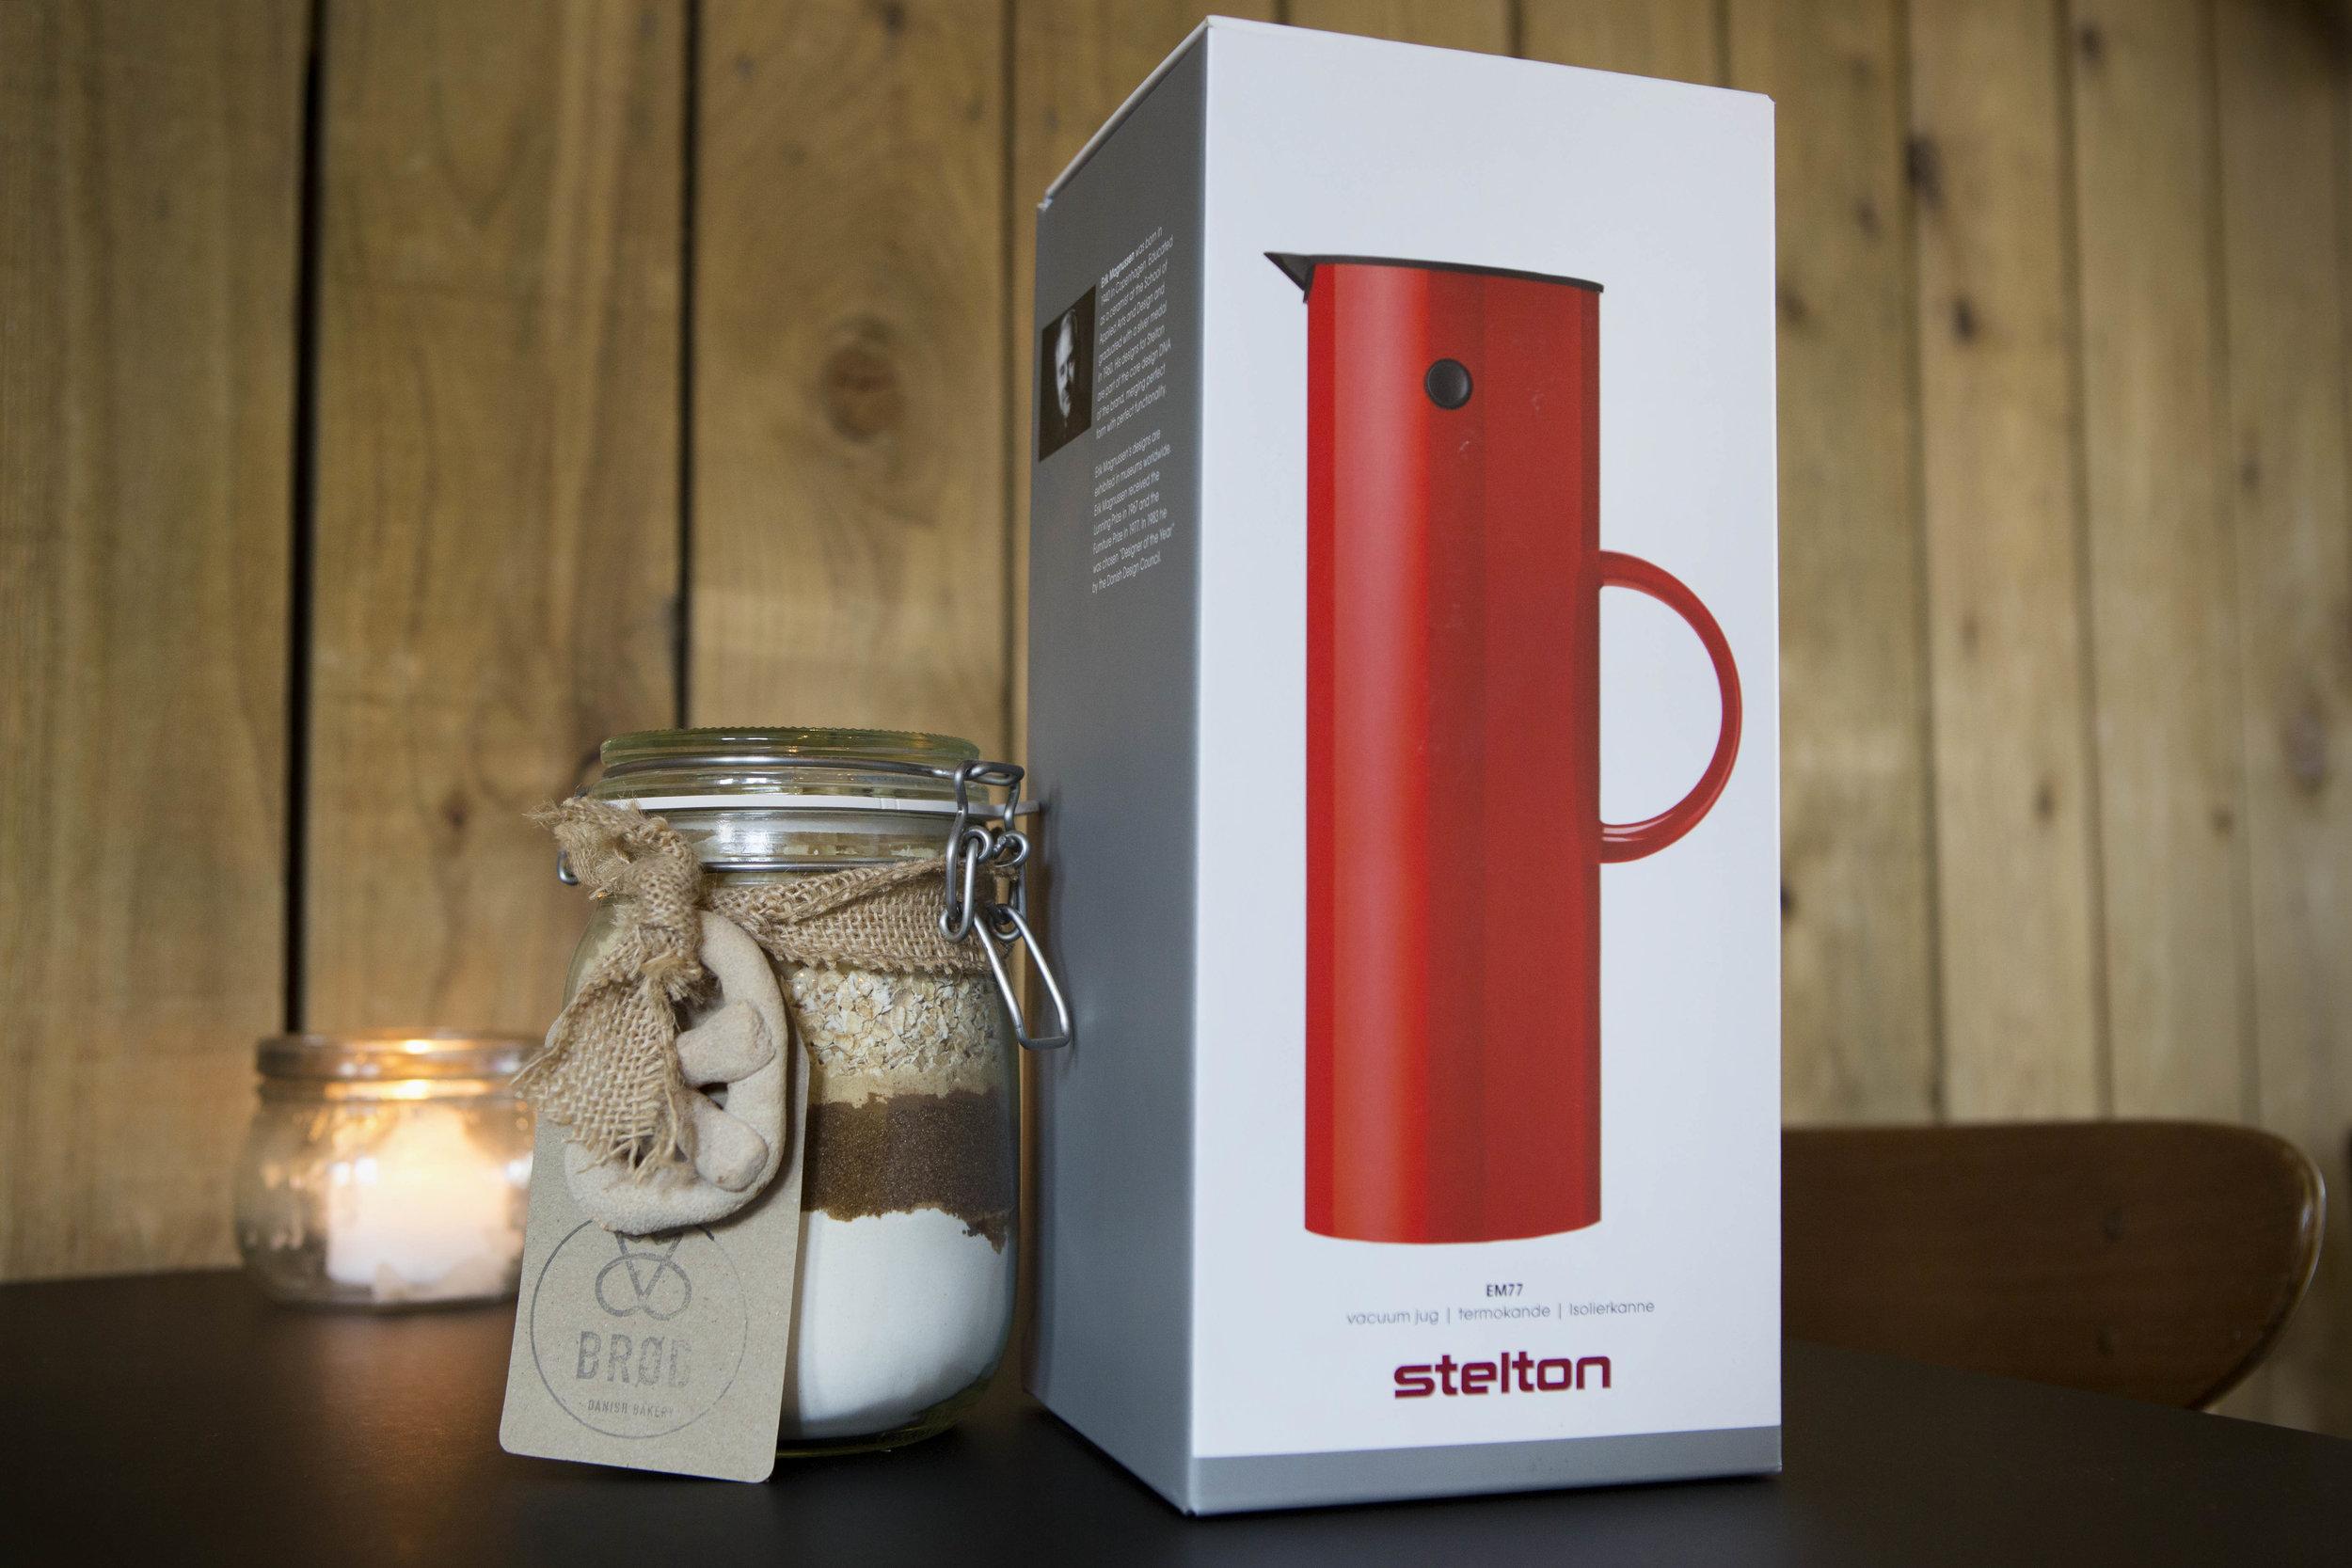 Stelton_DIY01a.jpg